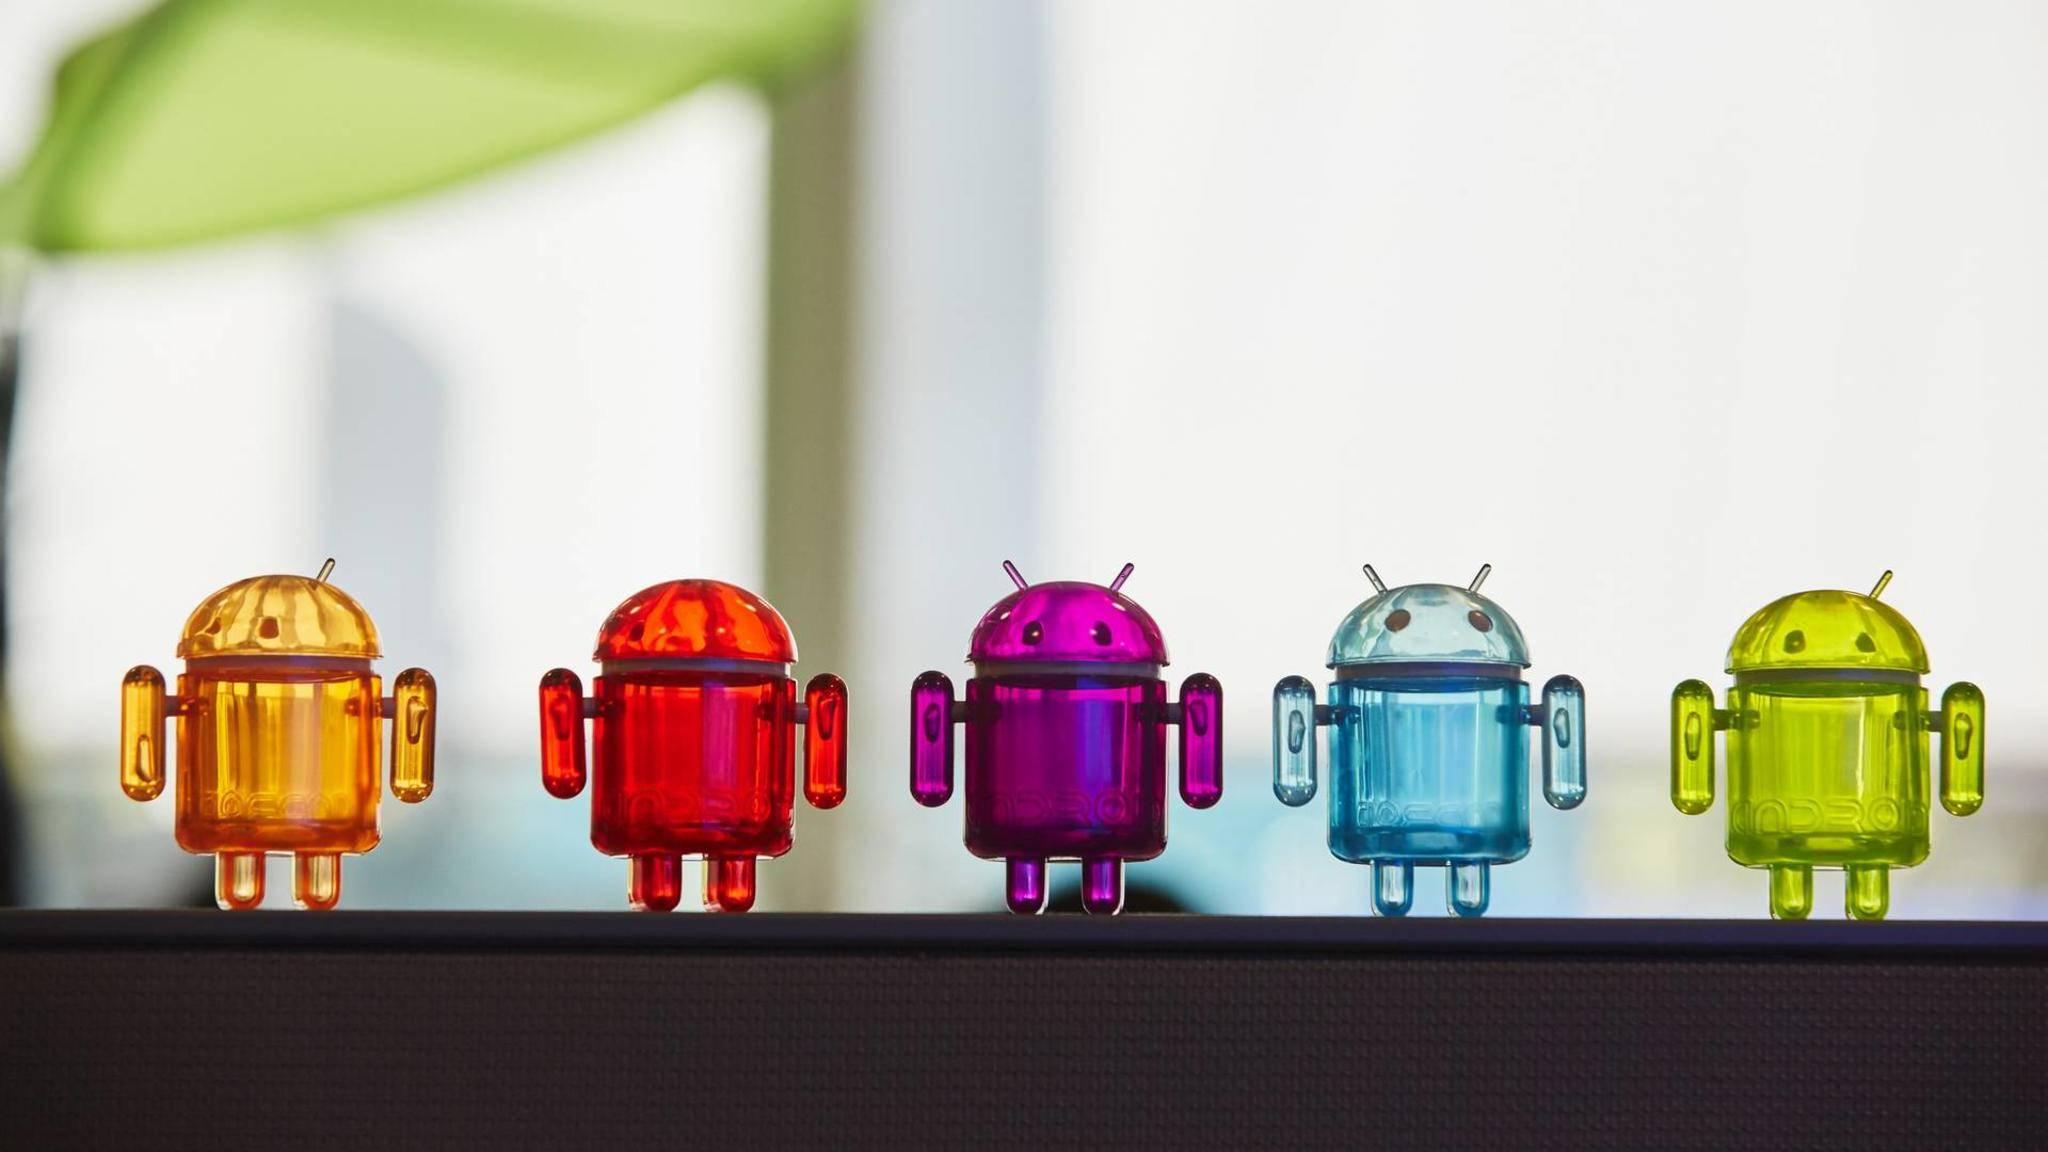 Android-Smartphones könnten in der EU bald teurer werden.